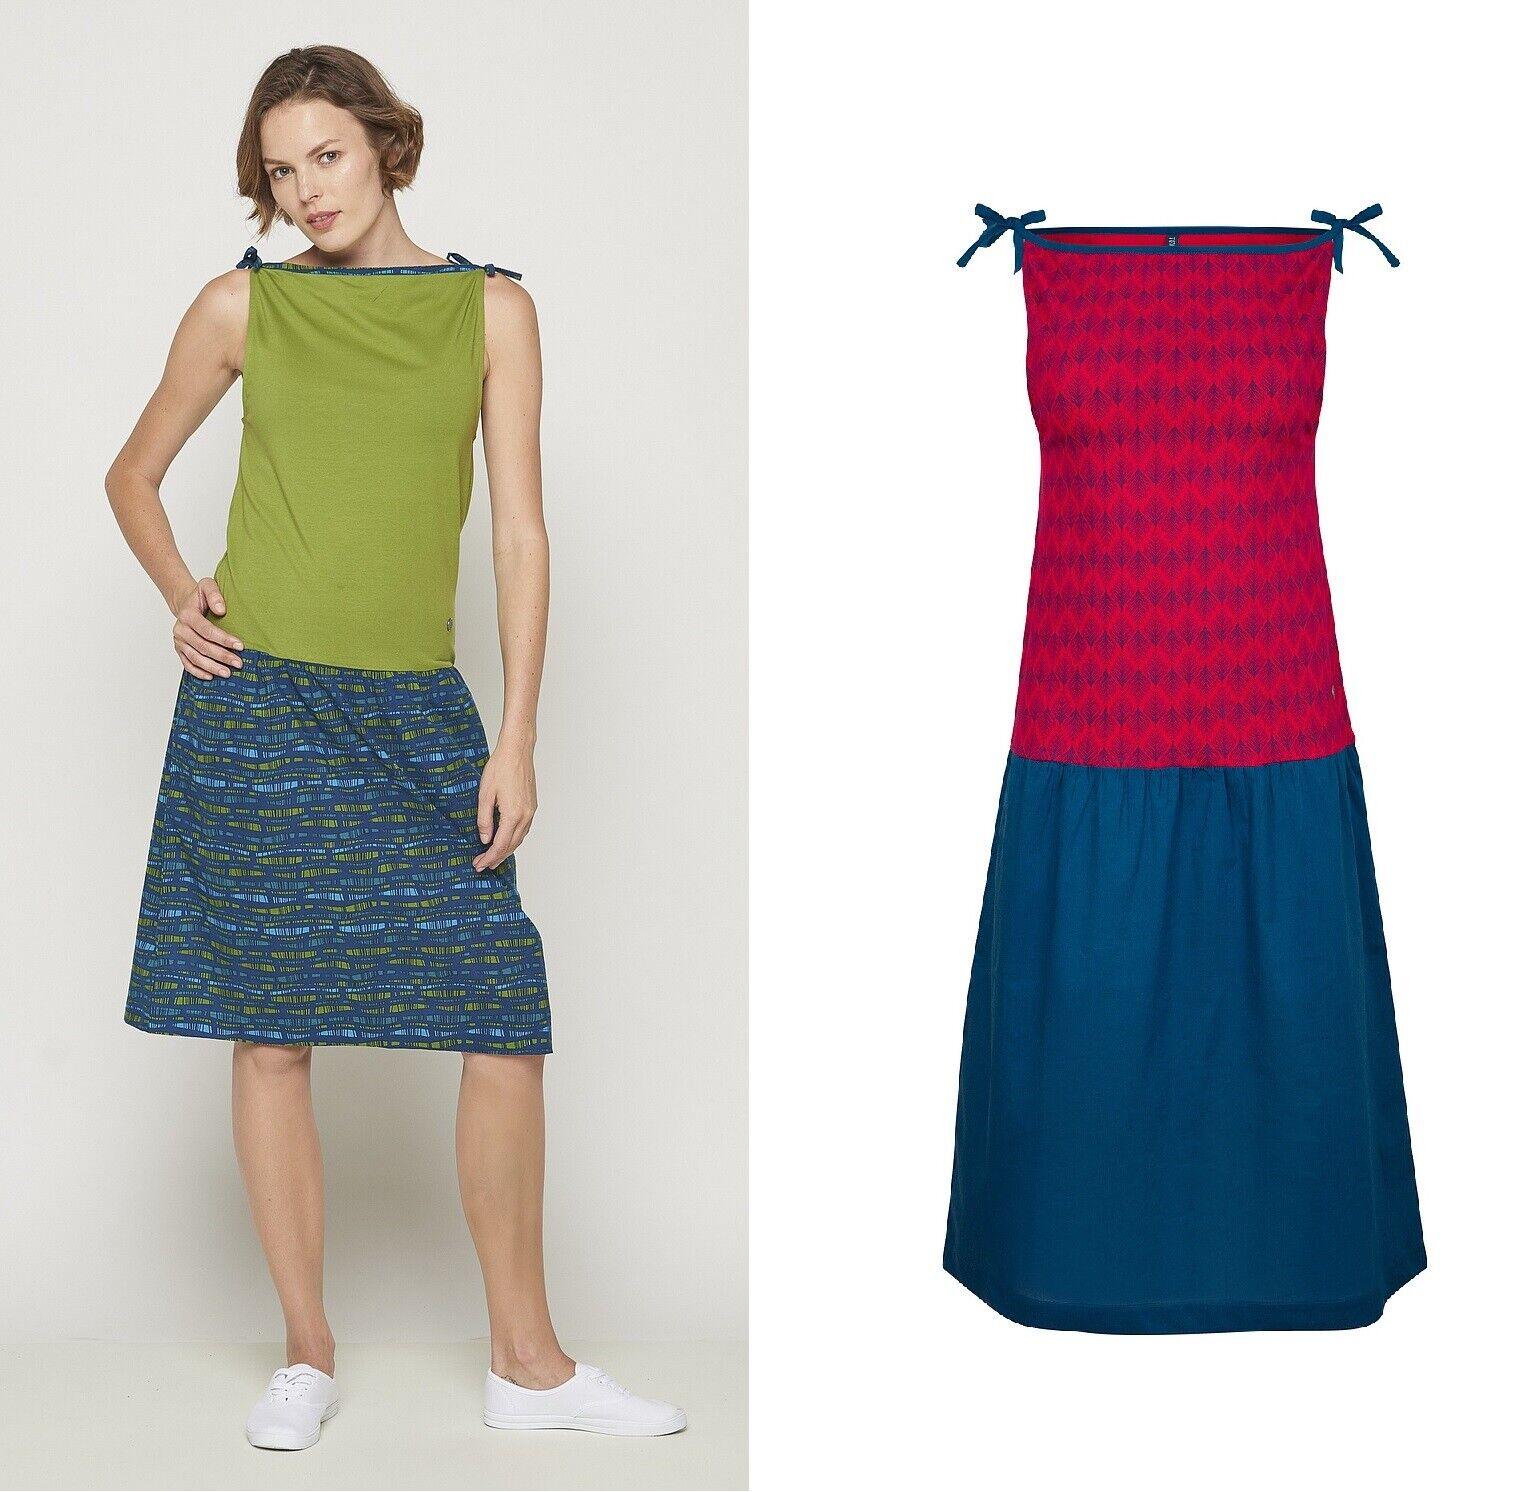 6f965dcbbaca4b Tranquillo Kleid Kombi-Kleid Bio-Baumwolle blau grün S19E27 rot Twiggy  npycli2420-neue Kleidung